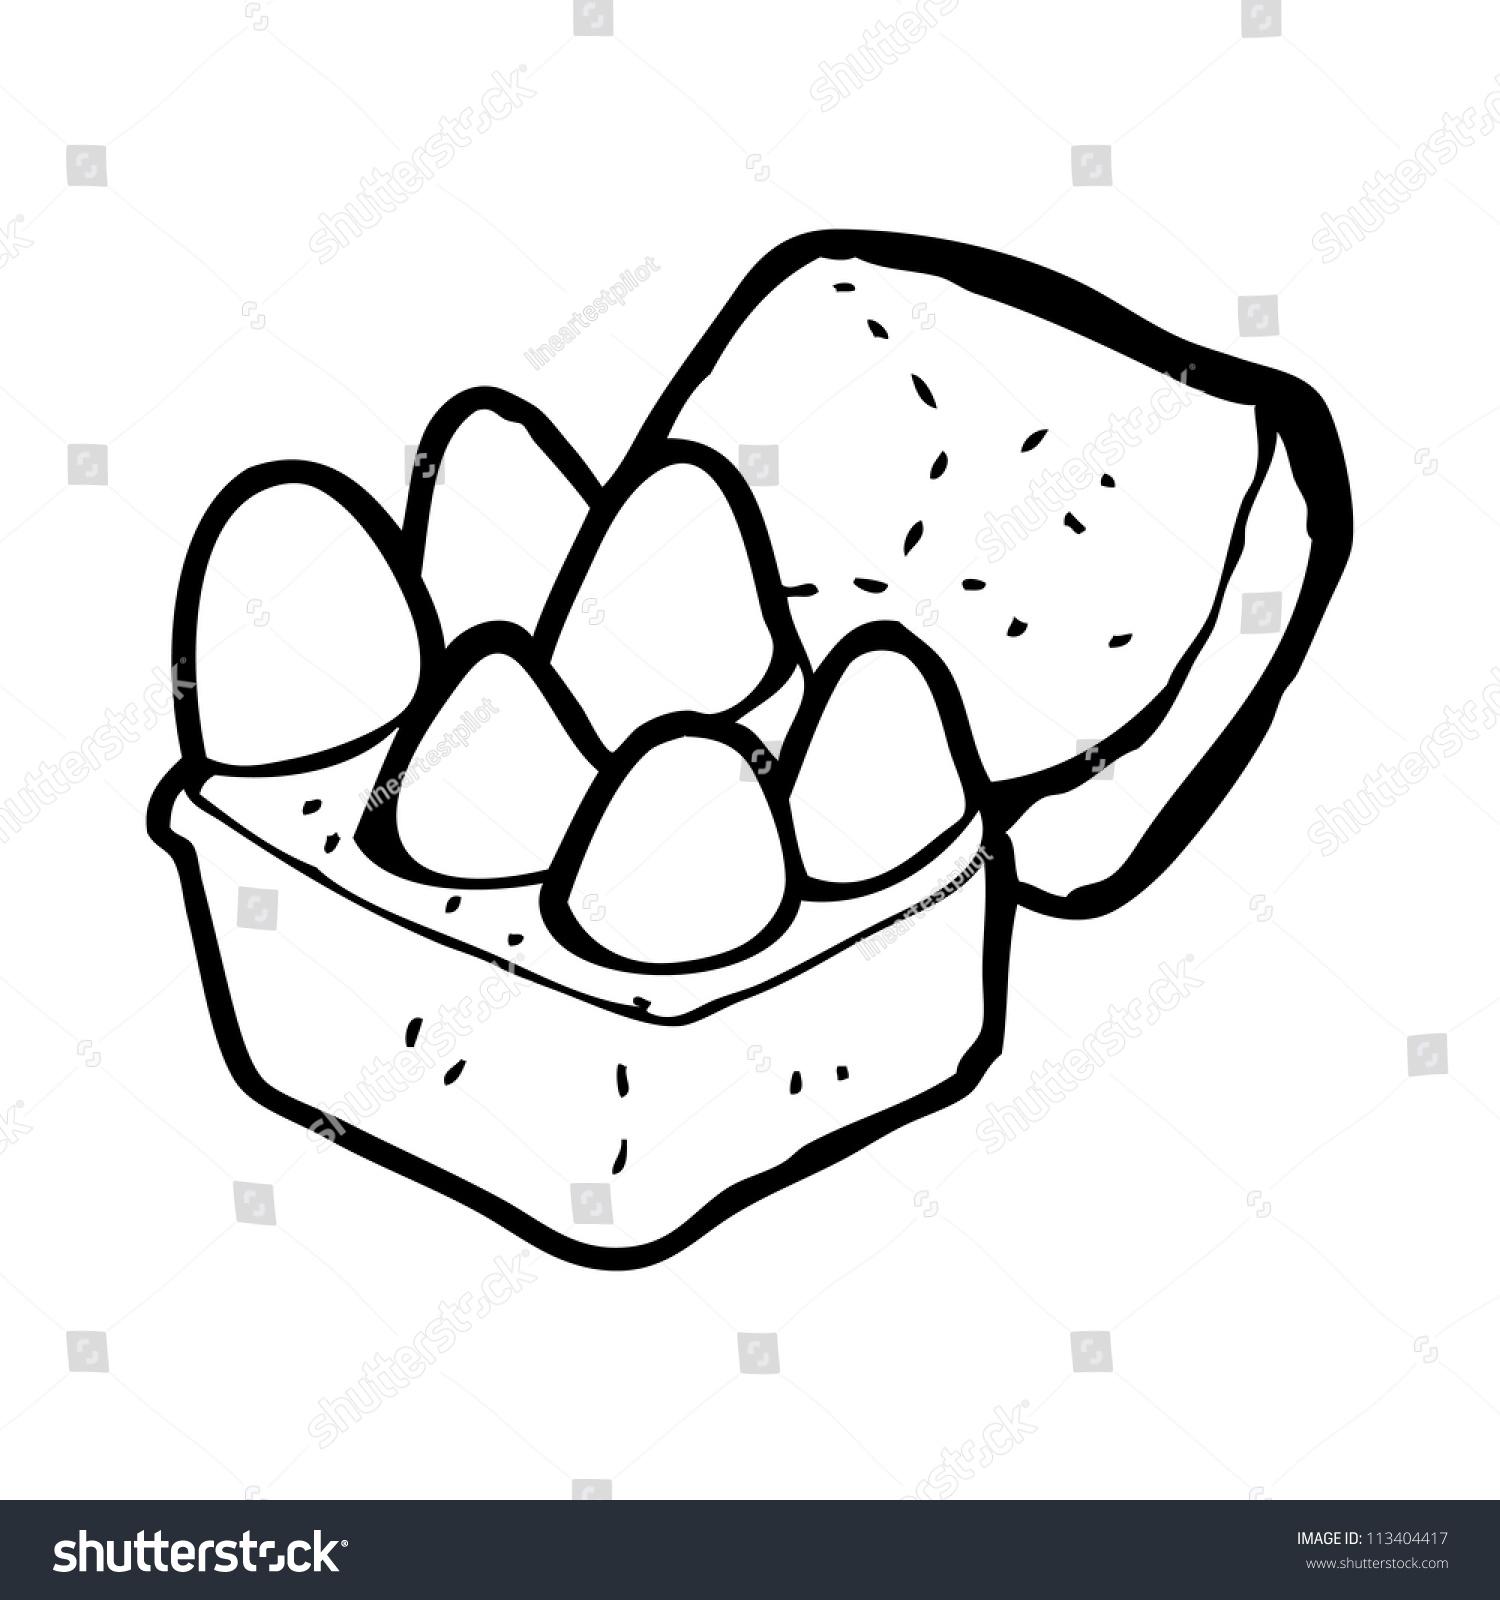 Line Drawing Egg : Cartoon eggs stock illustration shutterstock